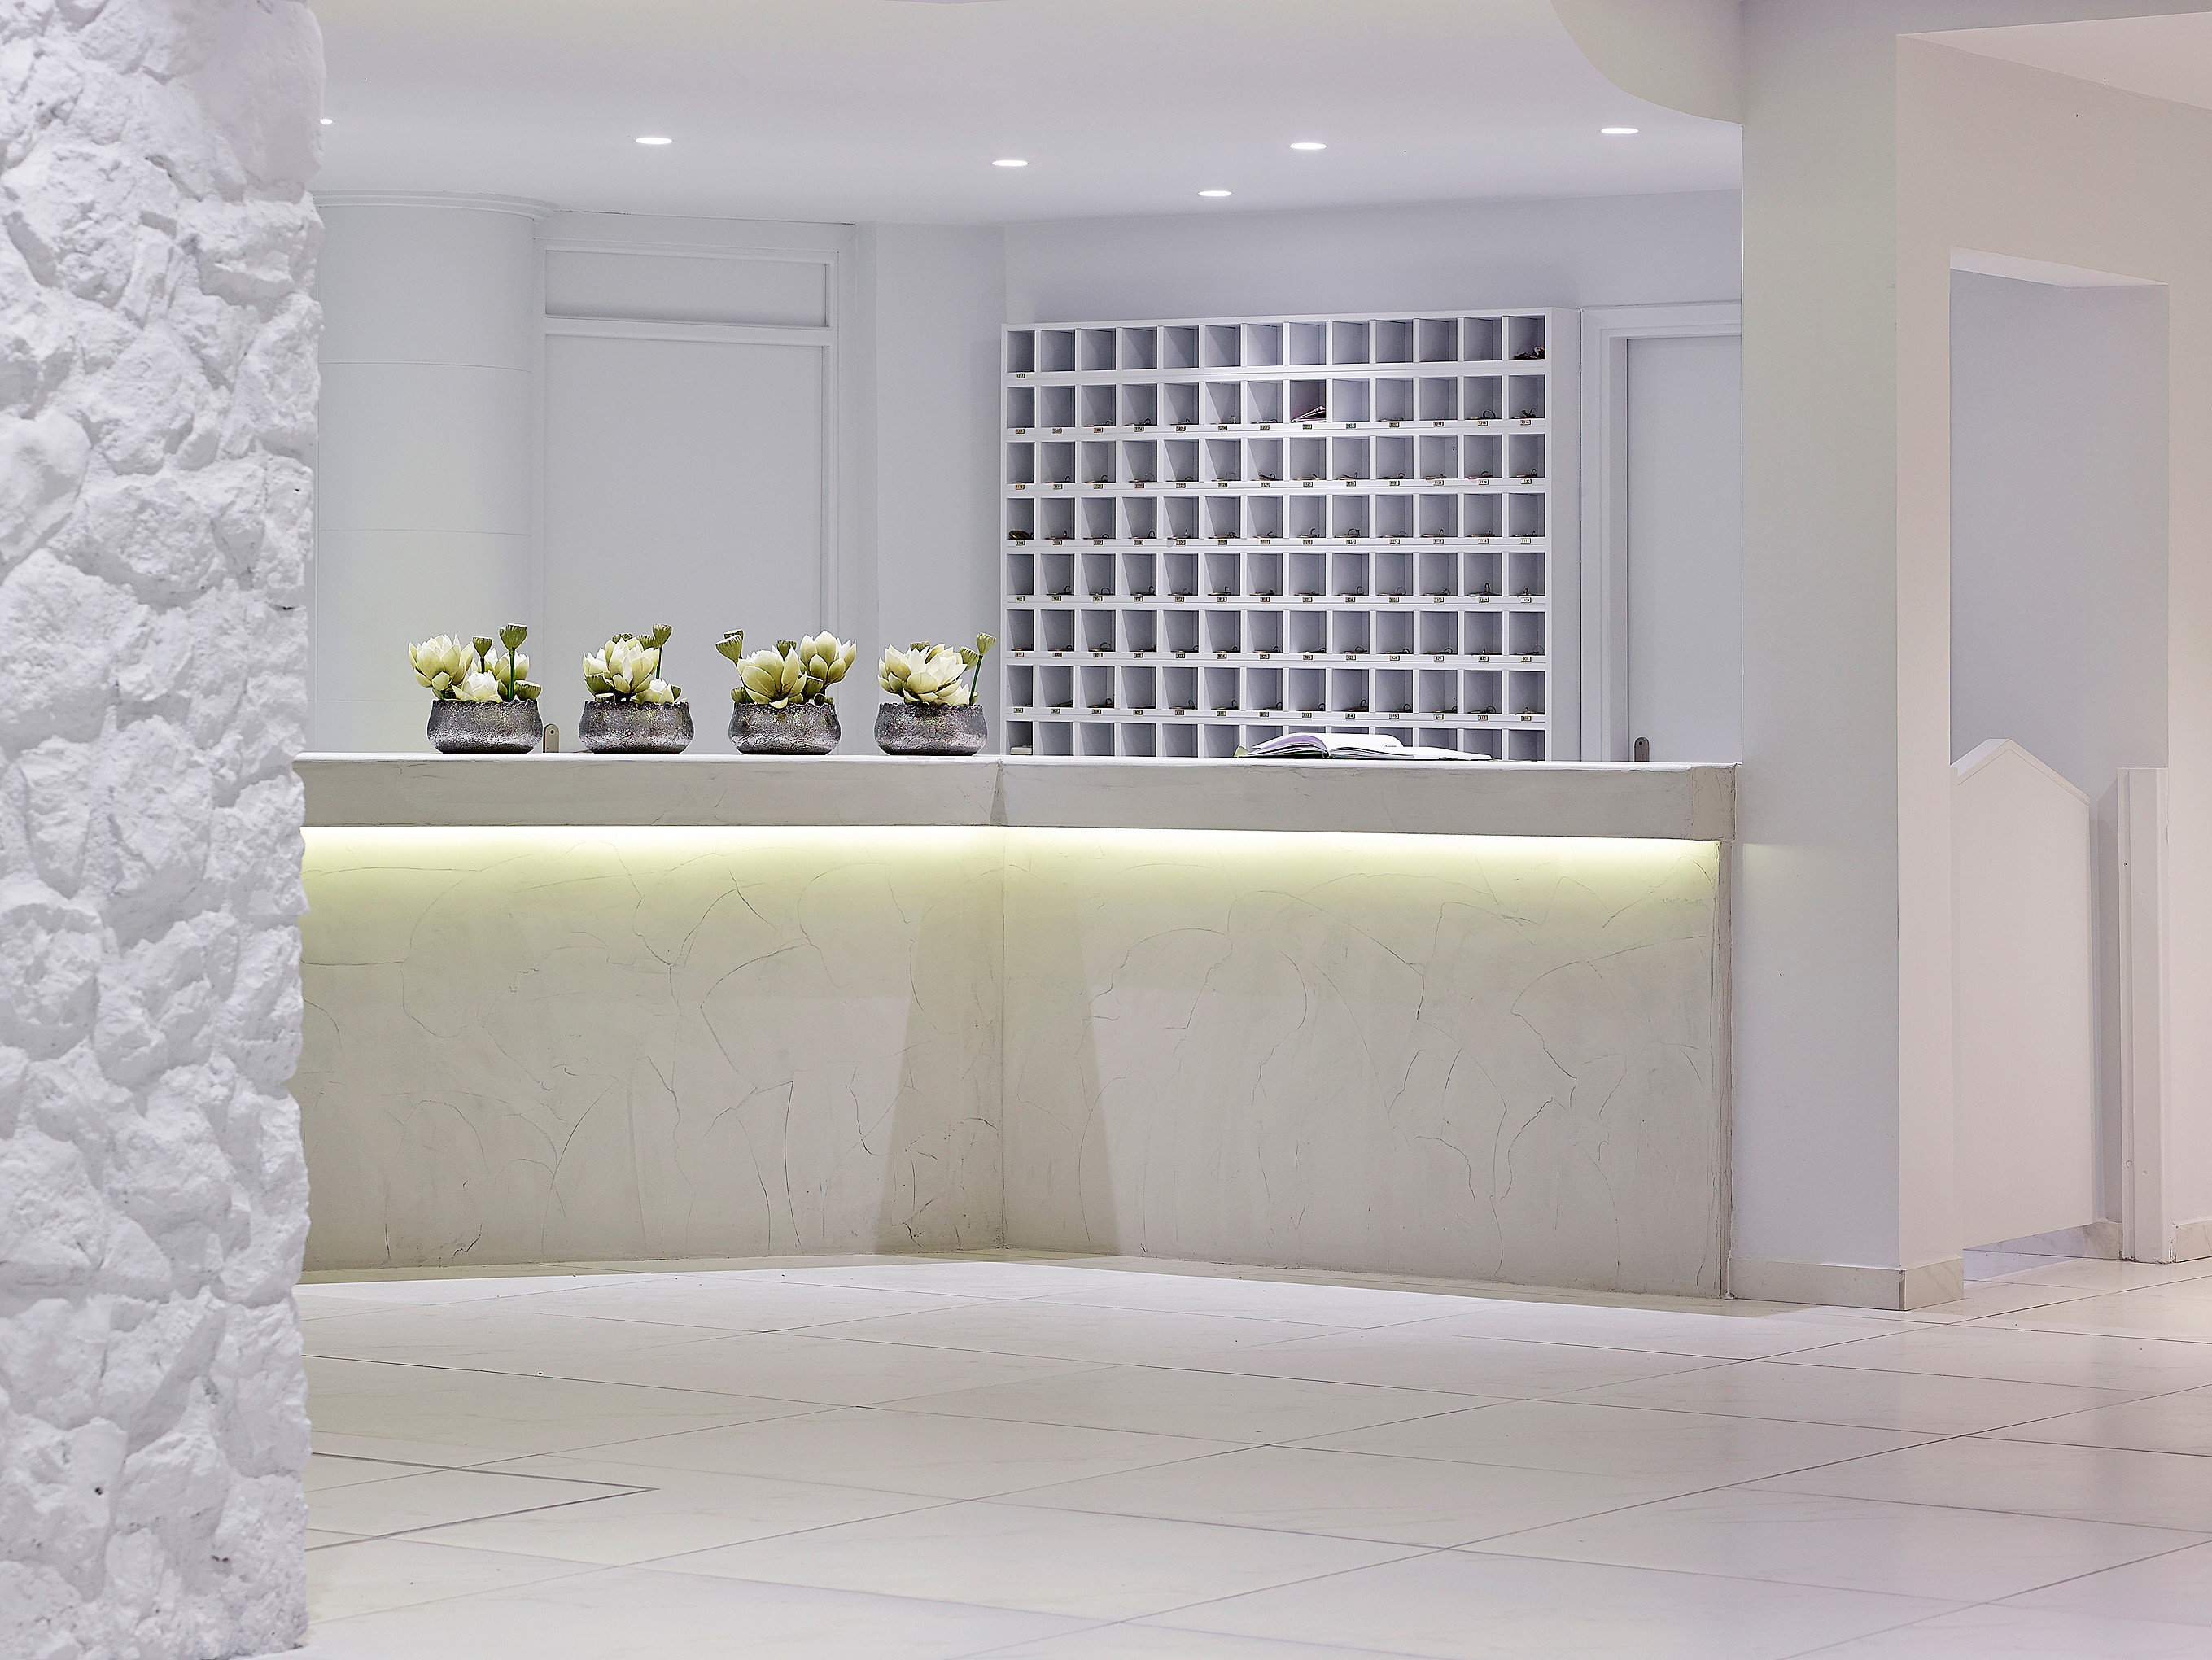 white property flooring tile bathroom bathtub plumbing fixture